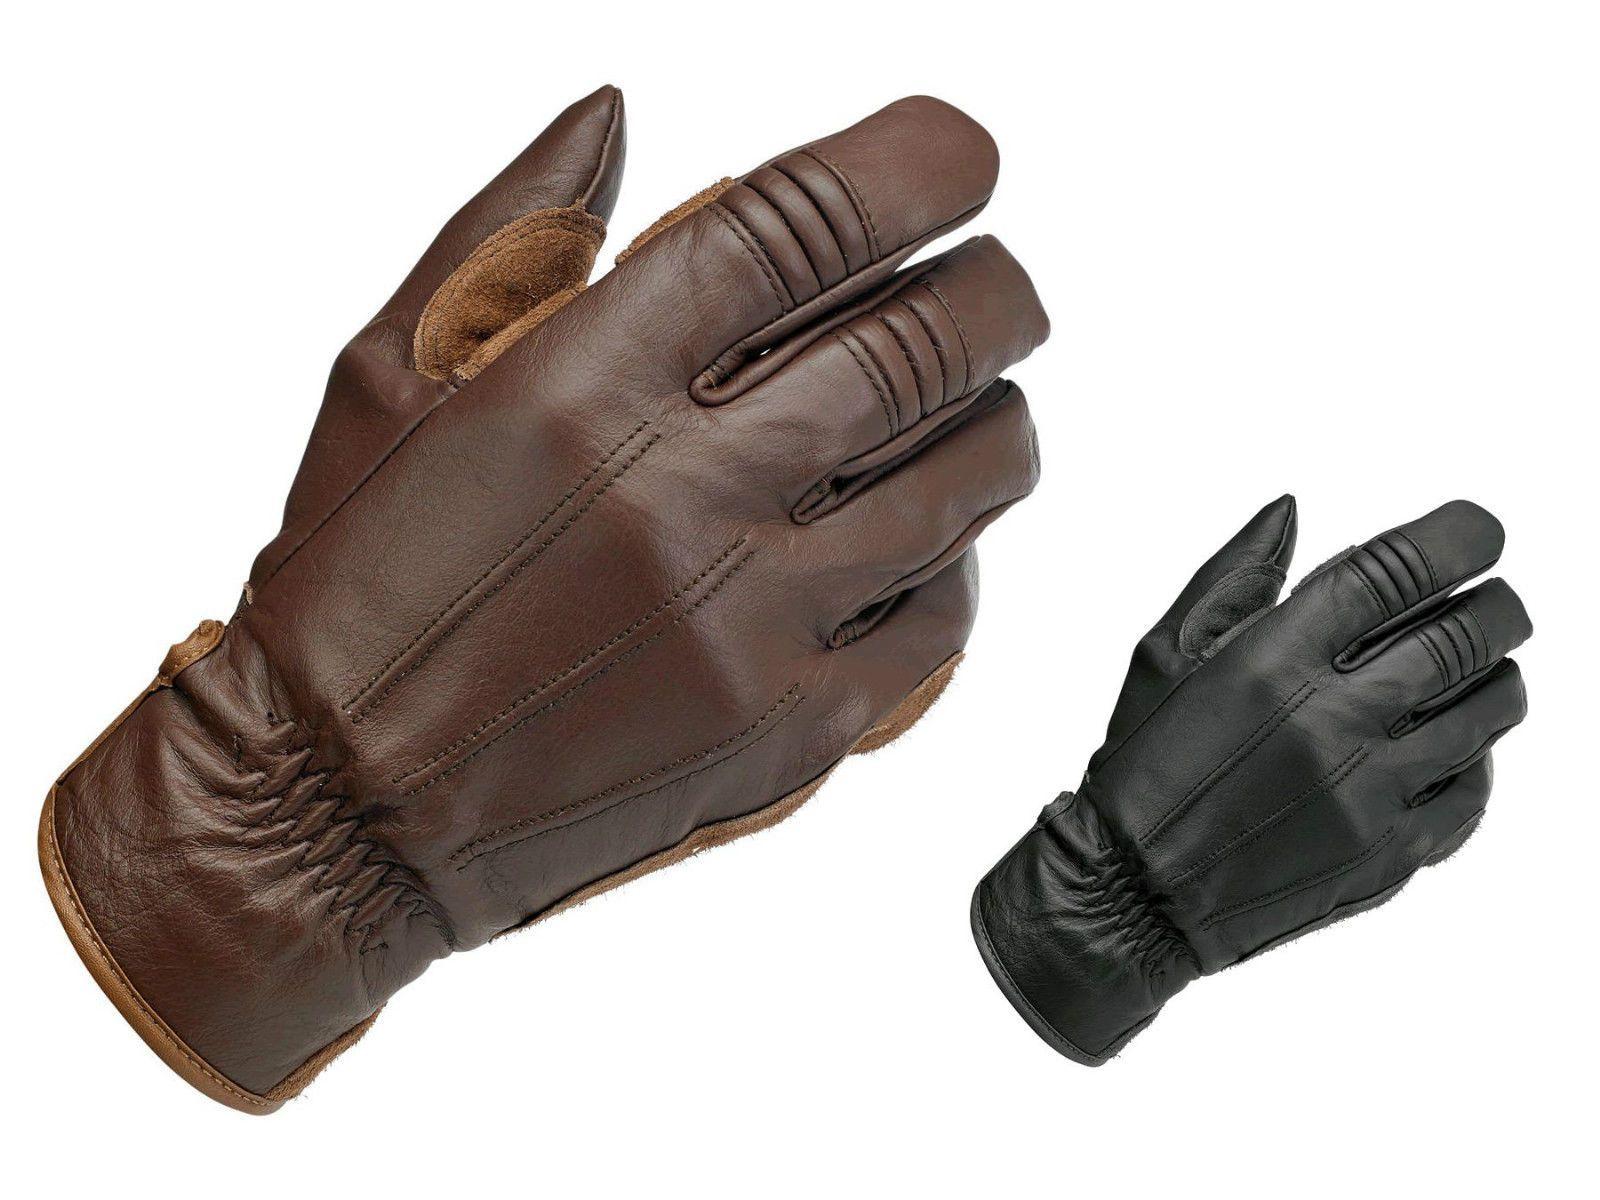 Motorcycle gloves cruiser - Biltwell Work Leather Cruiser Custom Cafe Racer Retro Motorcycle Gloves